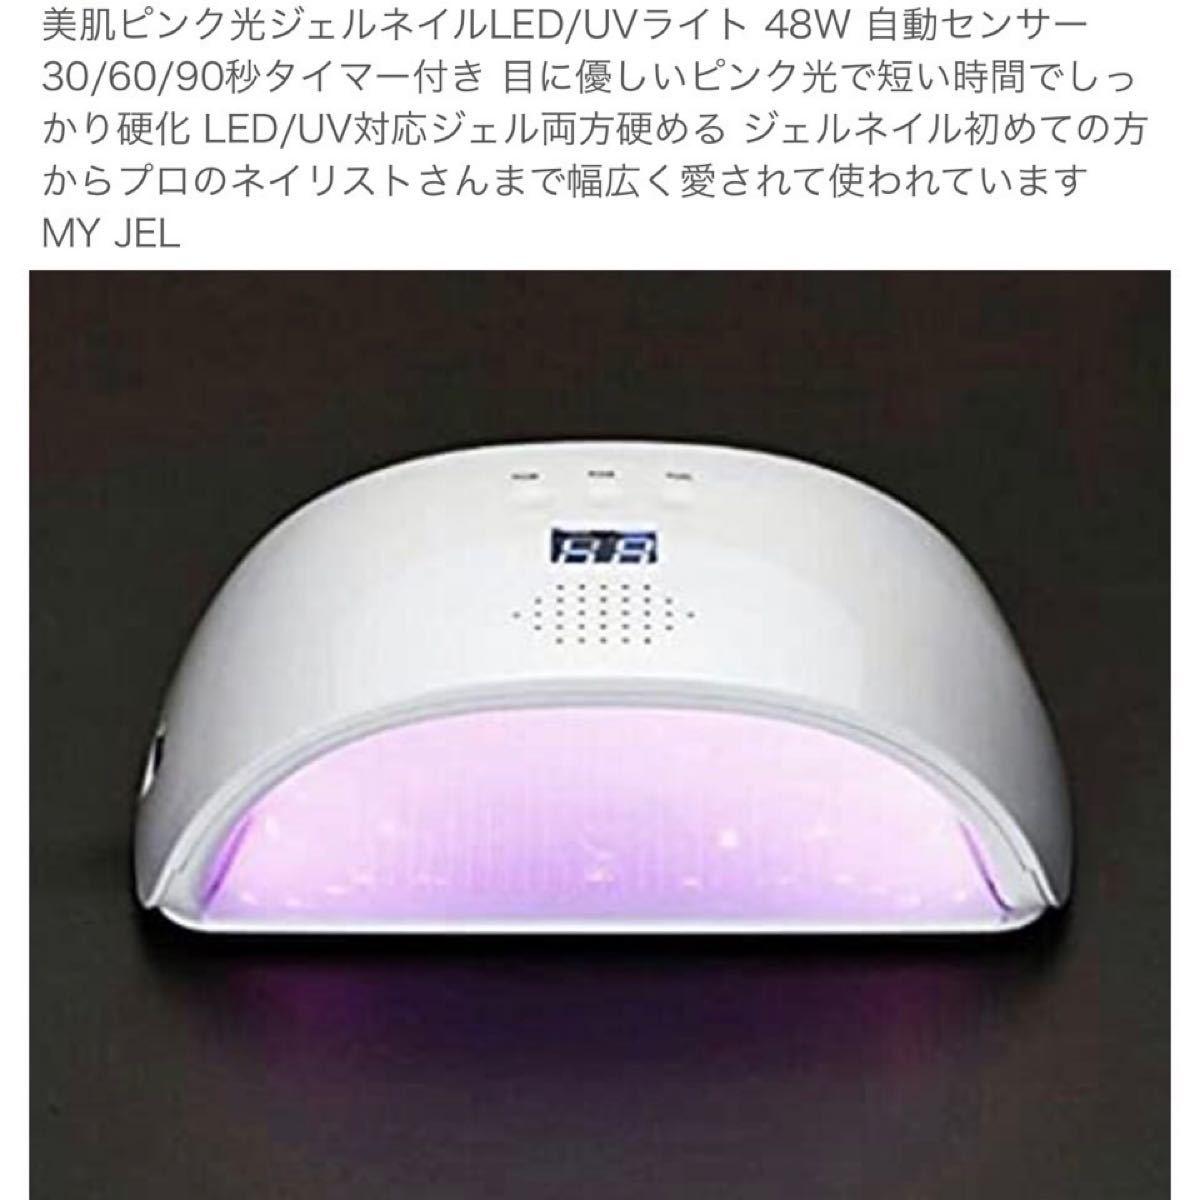 LED/UVライト